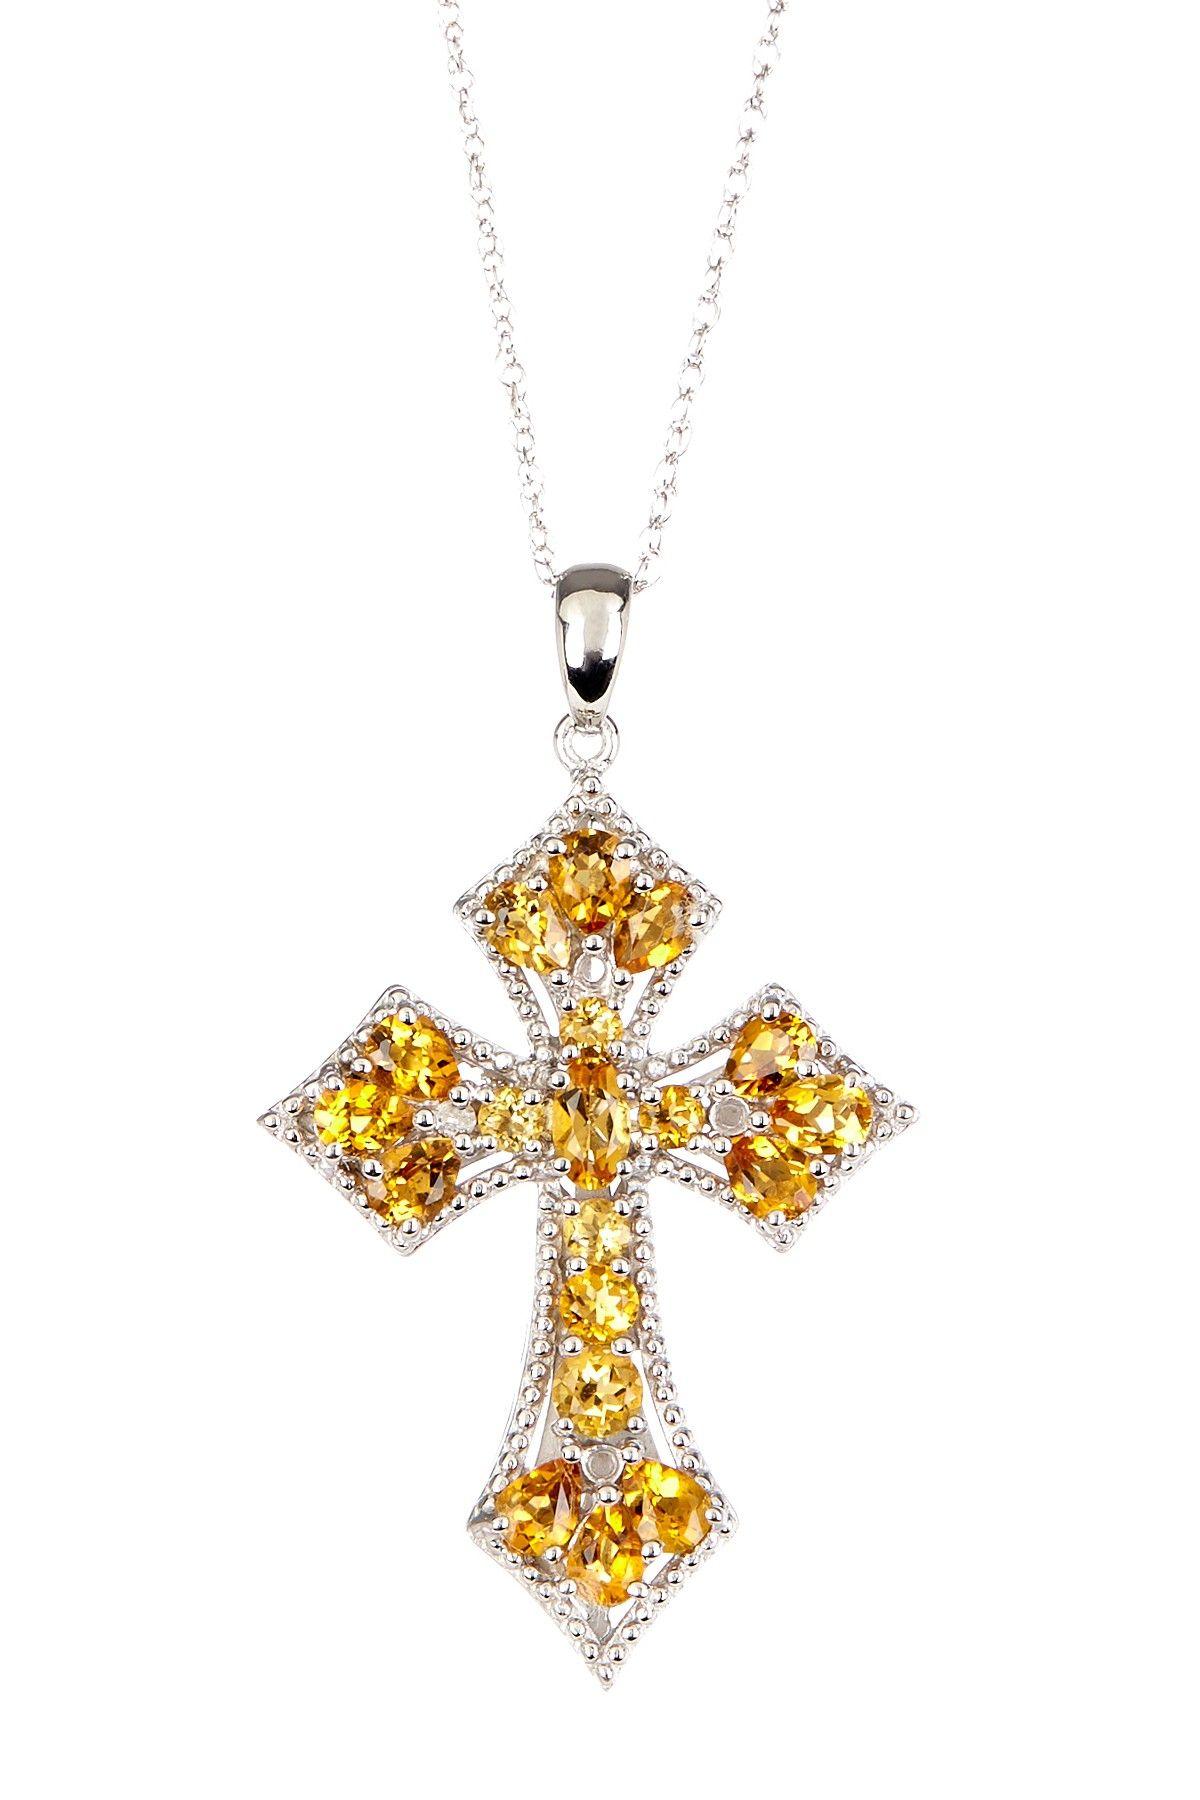 Sterling silver diamond citrine cross pendant necklace 006 ctw sterling silver diamond citrine cross pendant necklace 006 ctw aloadofball Gallery